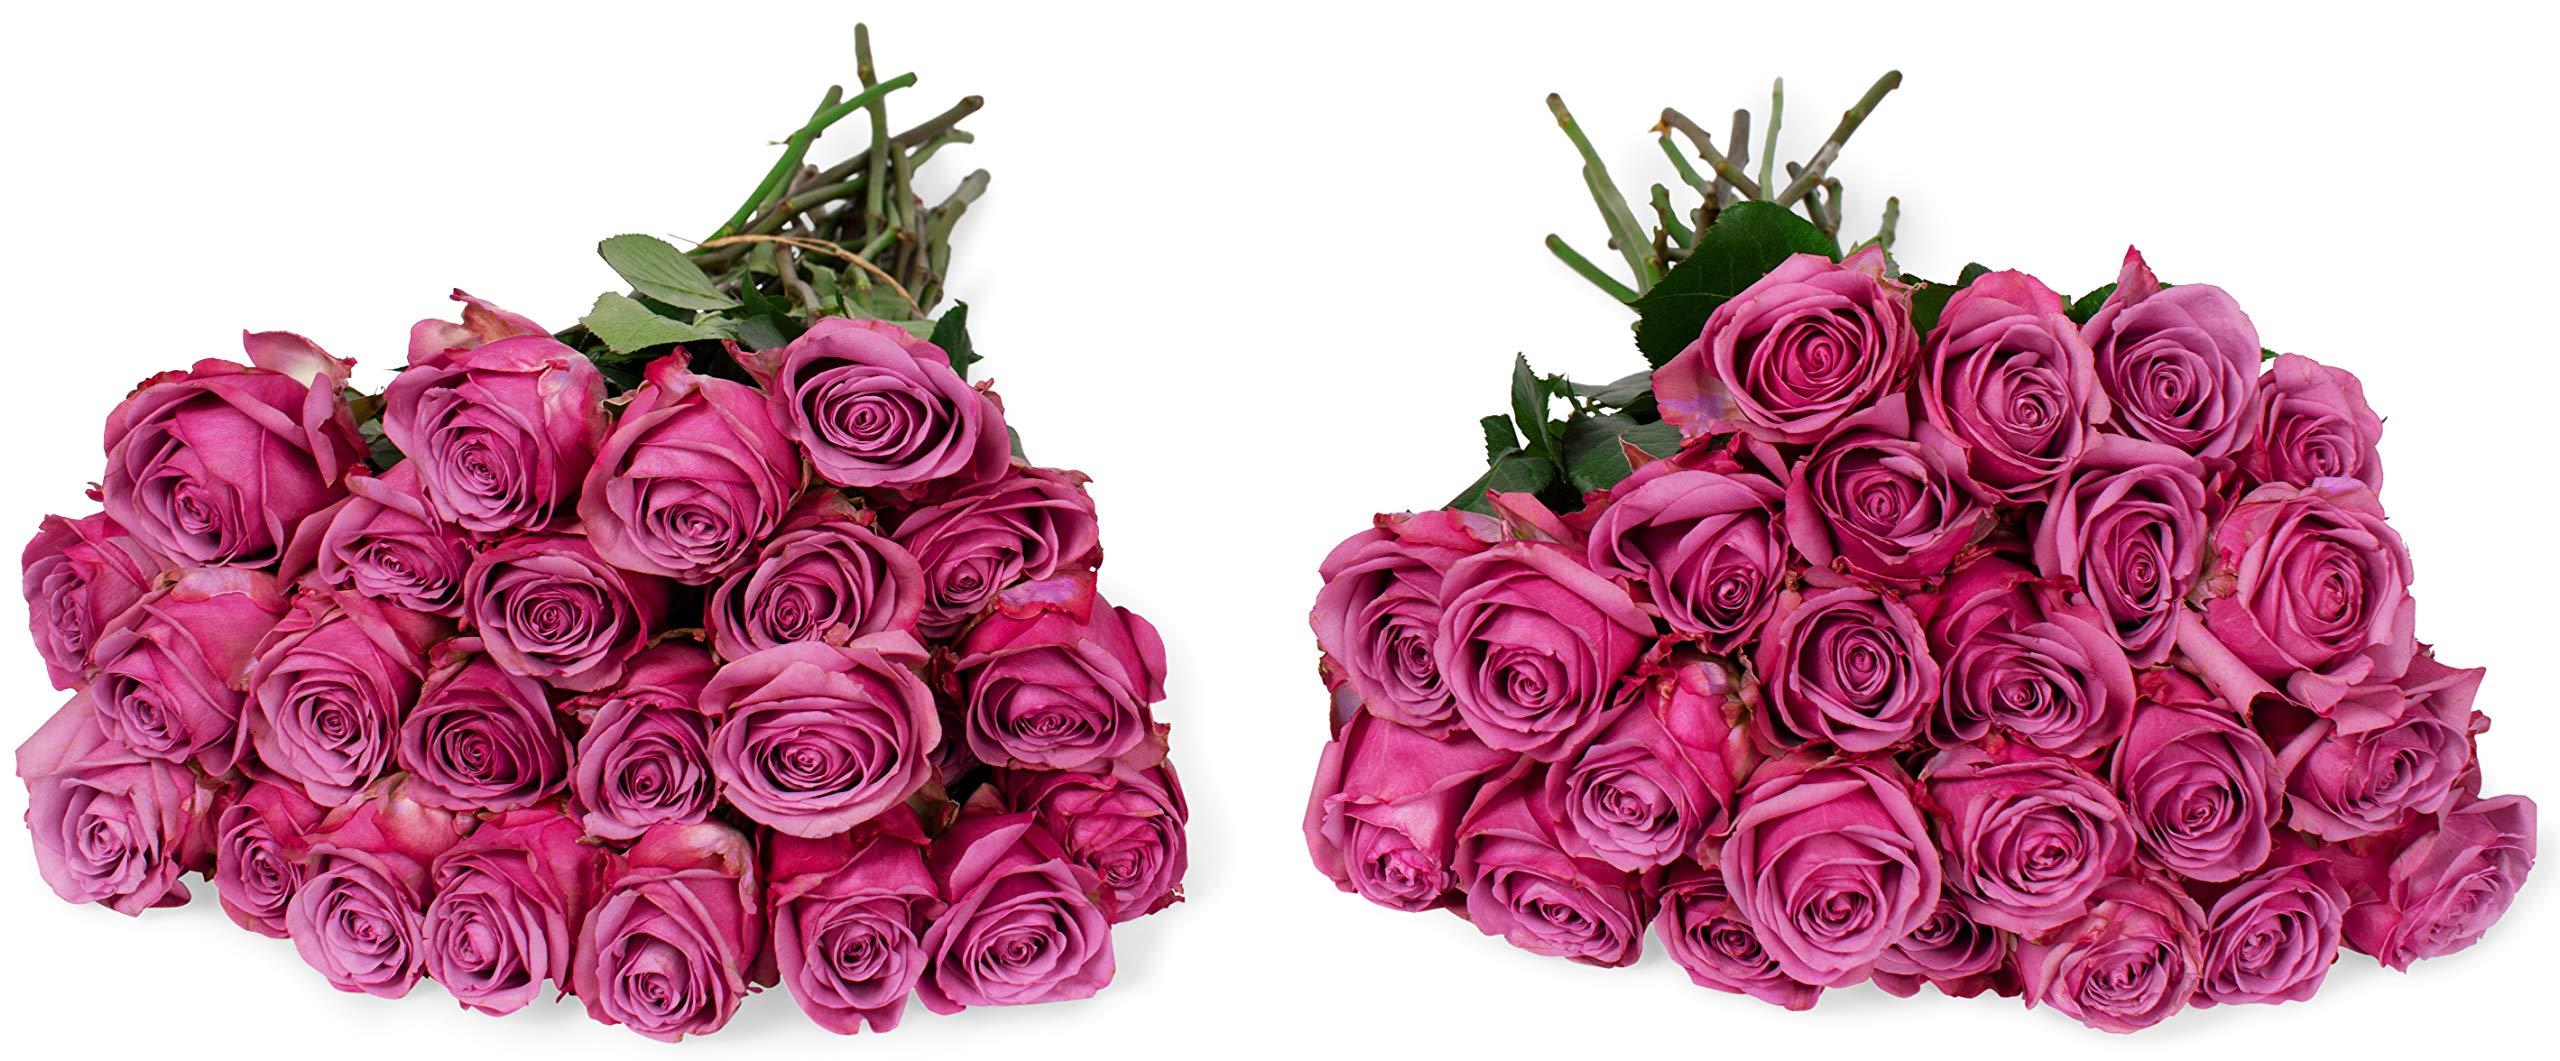 Benchmark Bouquets 50 Lavender Roses Farm Direct (Fresh Cut Flowers)